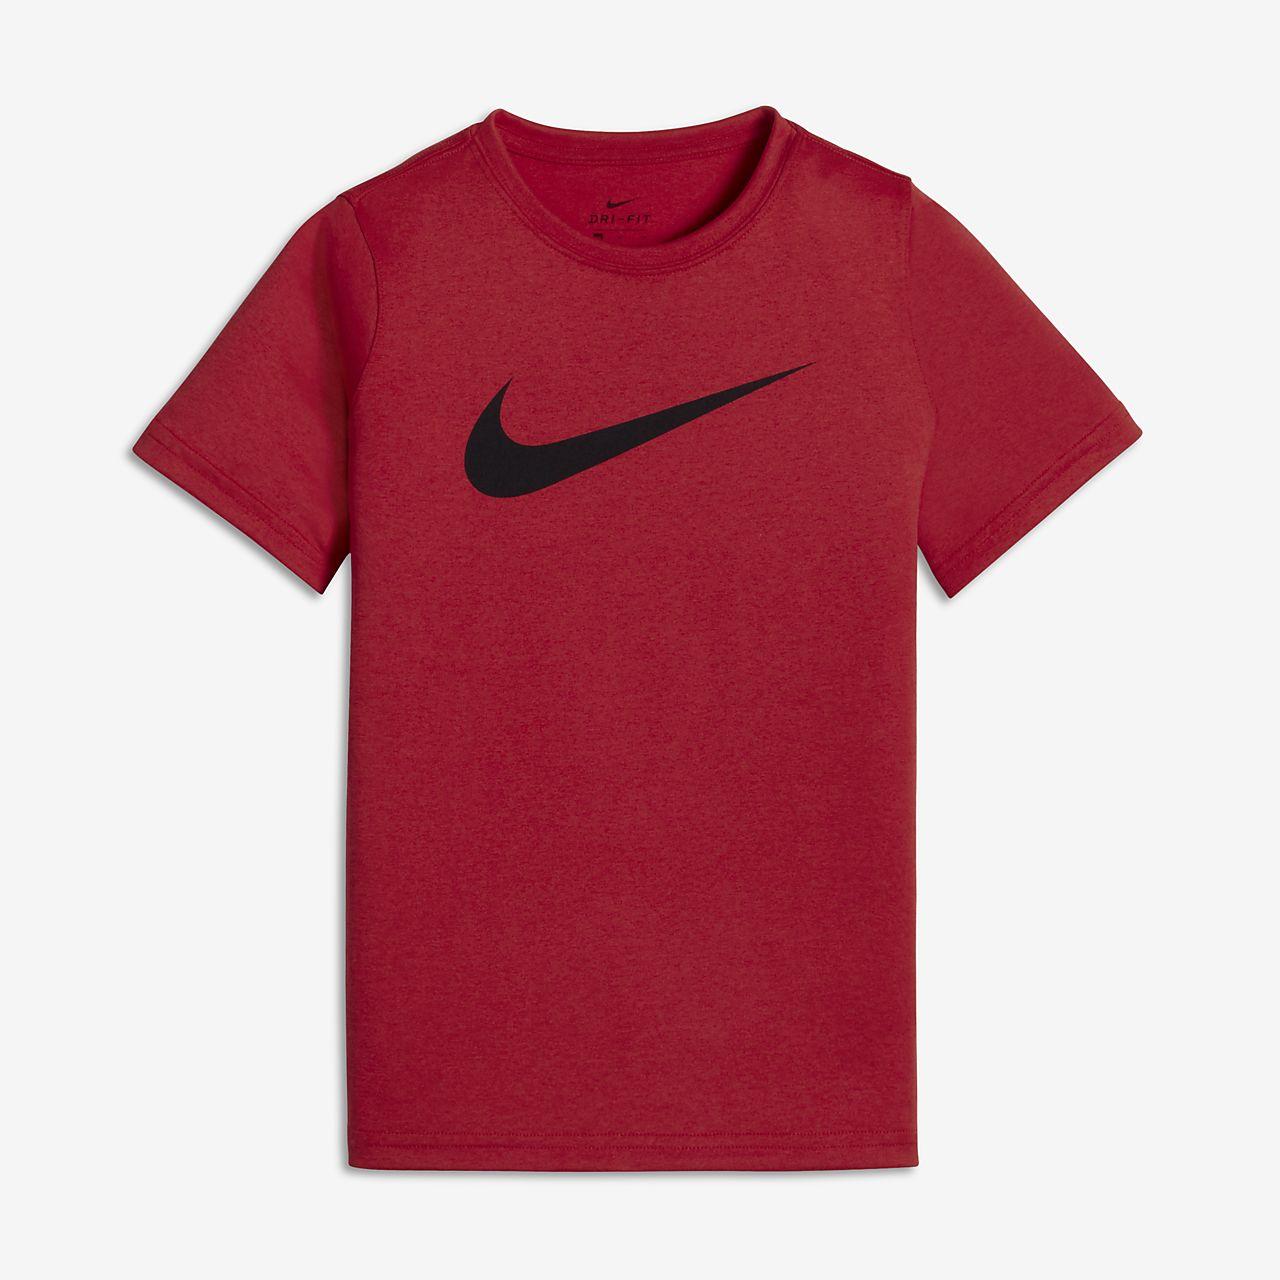 Nike Dri-FIT Big Kids' (Boys') Training T-Shirt. Nike.com